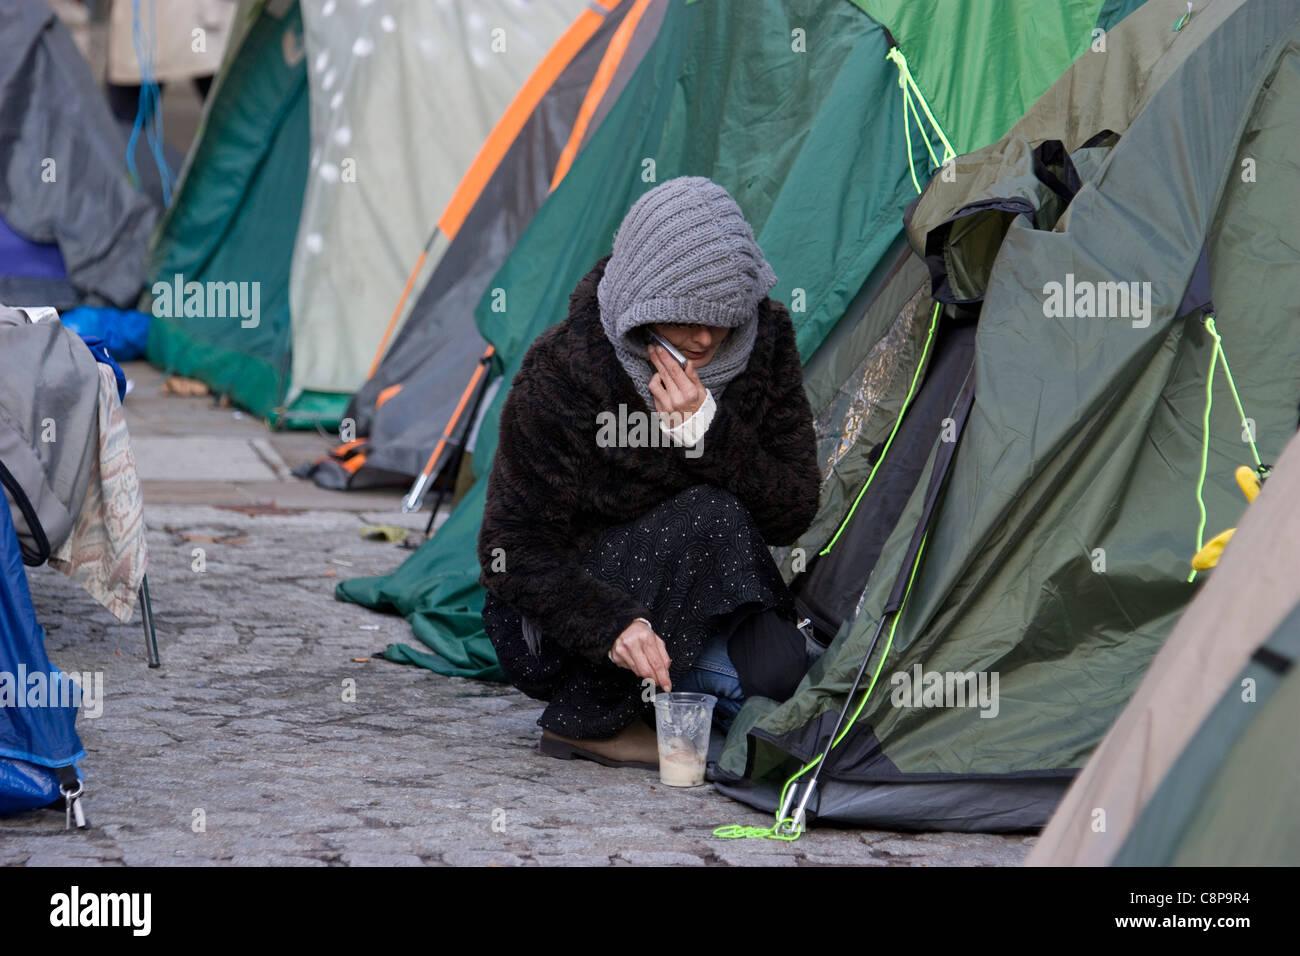 Camping manifestante en St Pauls Cathedral, ocupar Londres protesta con carpas Imagen De Stock